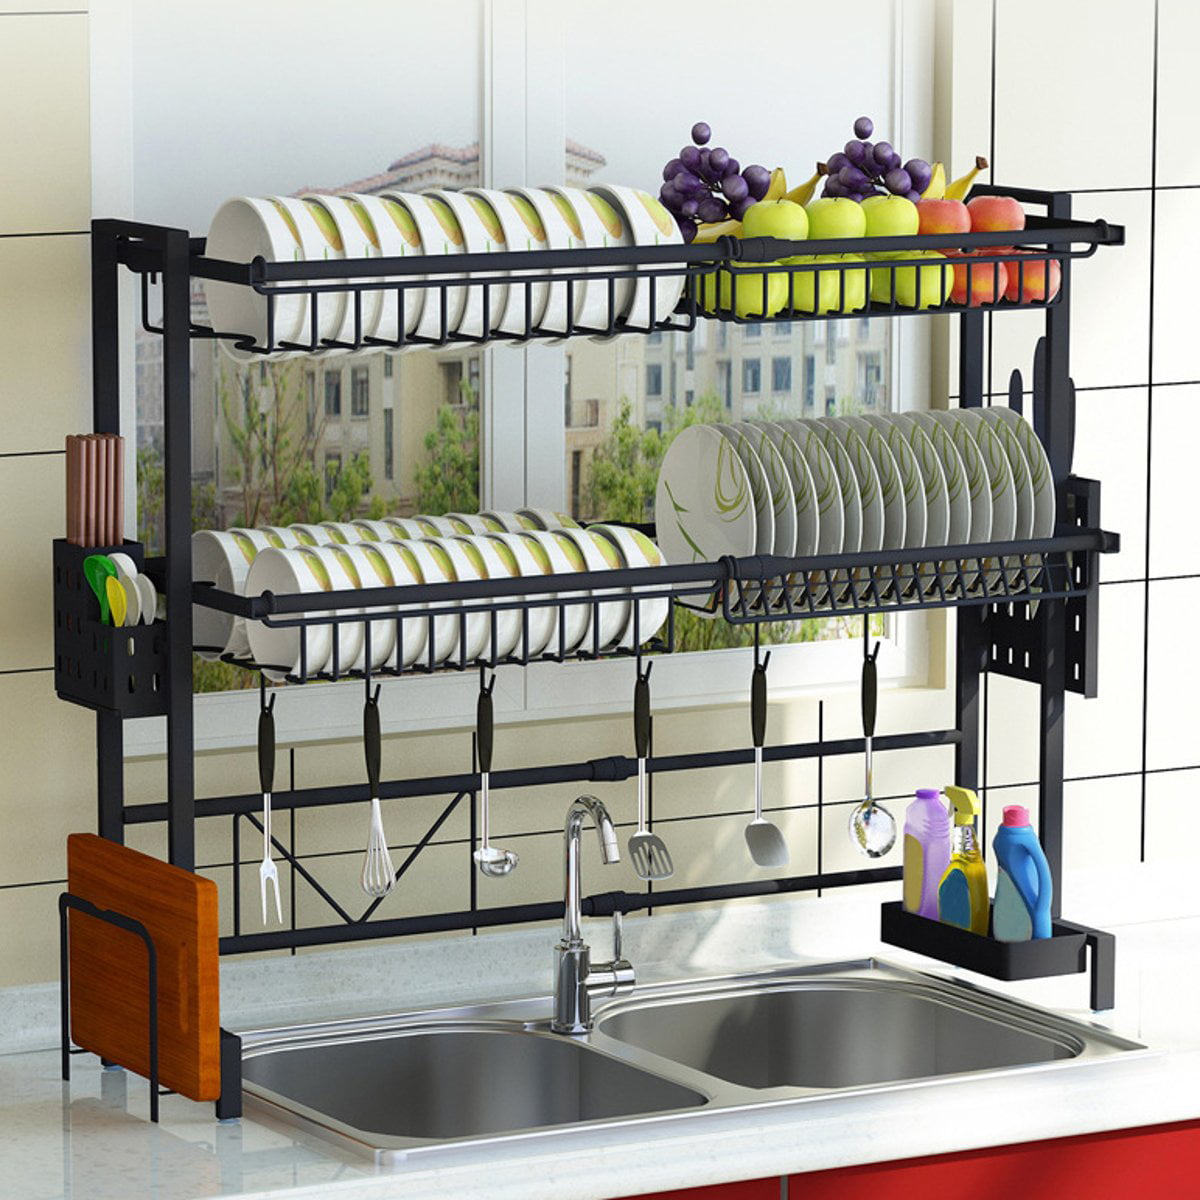 Upgraded 1 2tier Sink Rack Dish Drainer For Kitchen Sink Racks Stainless Steel Over The Sink Shelf Storage Rack Walmart Com Walmart Com